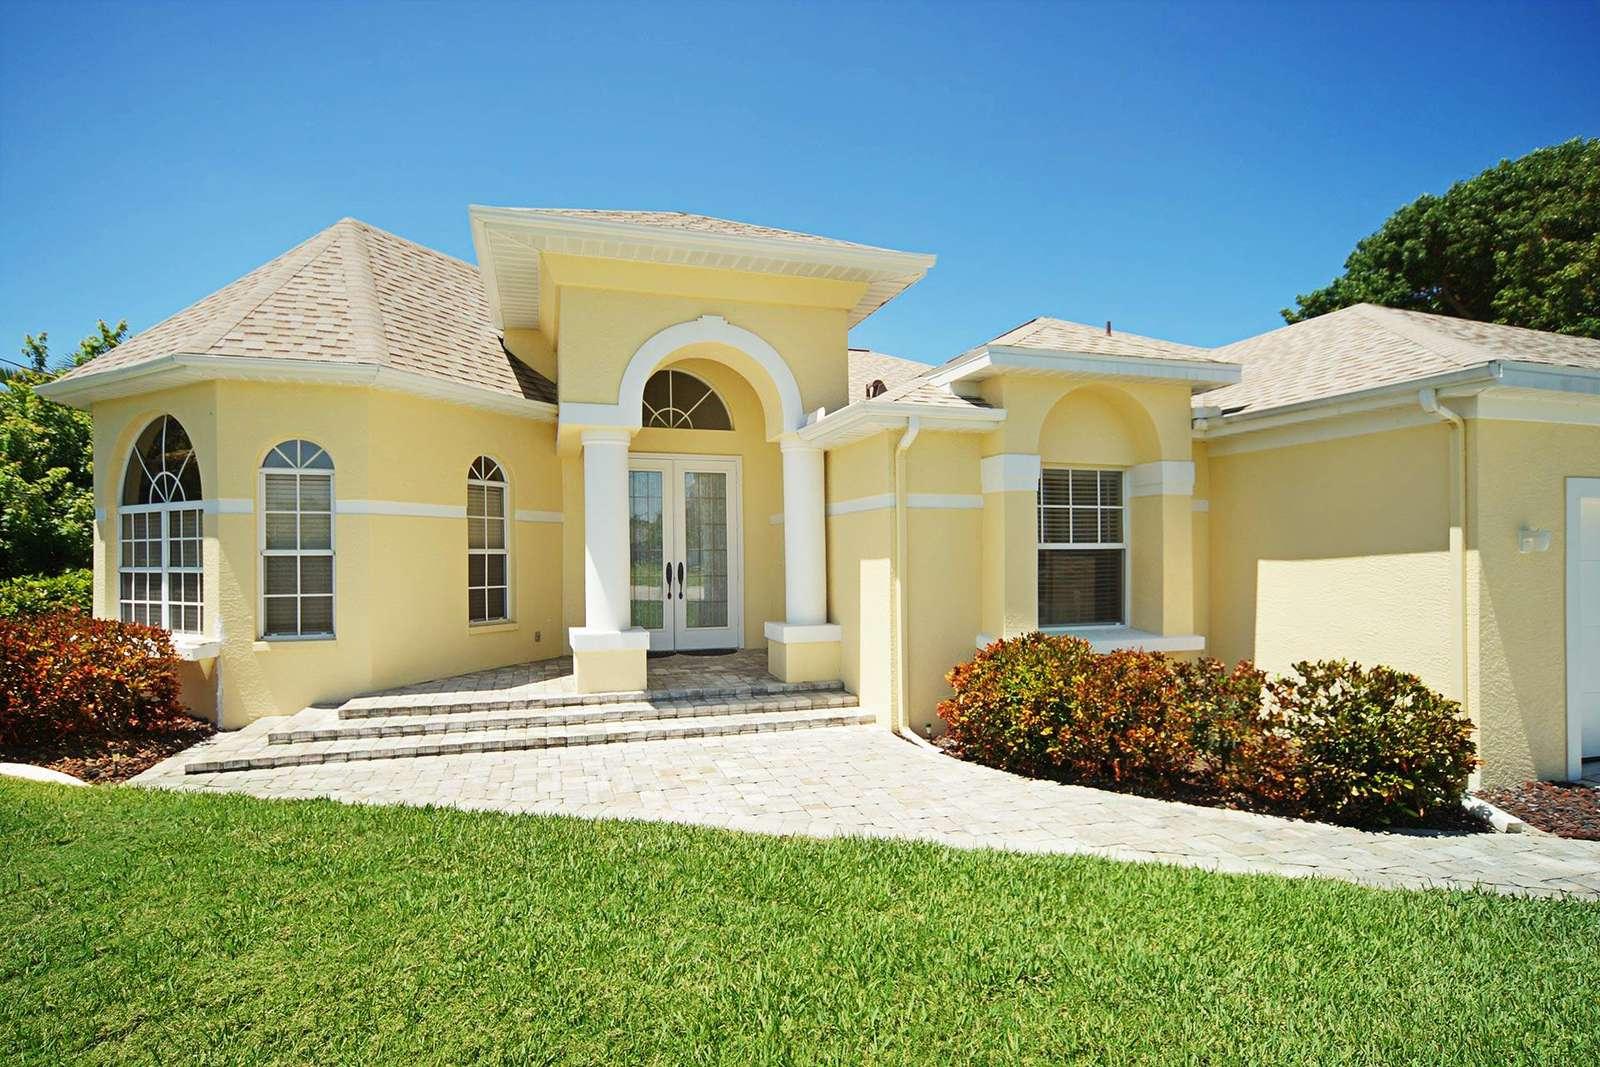 Wischis Florida Home - Ferienhaus - Treasure Island - Hausverwaltung - Immobilien